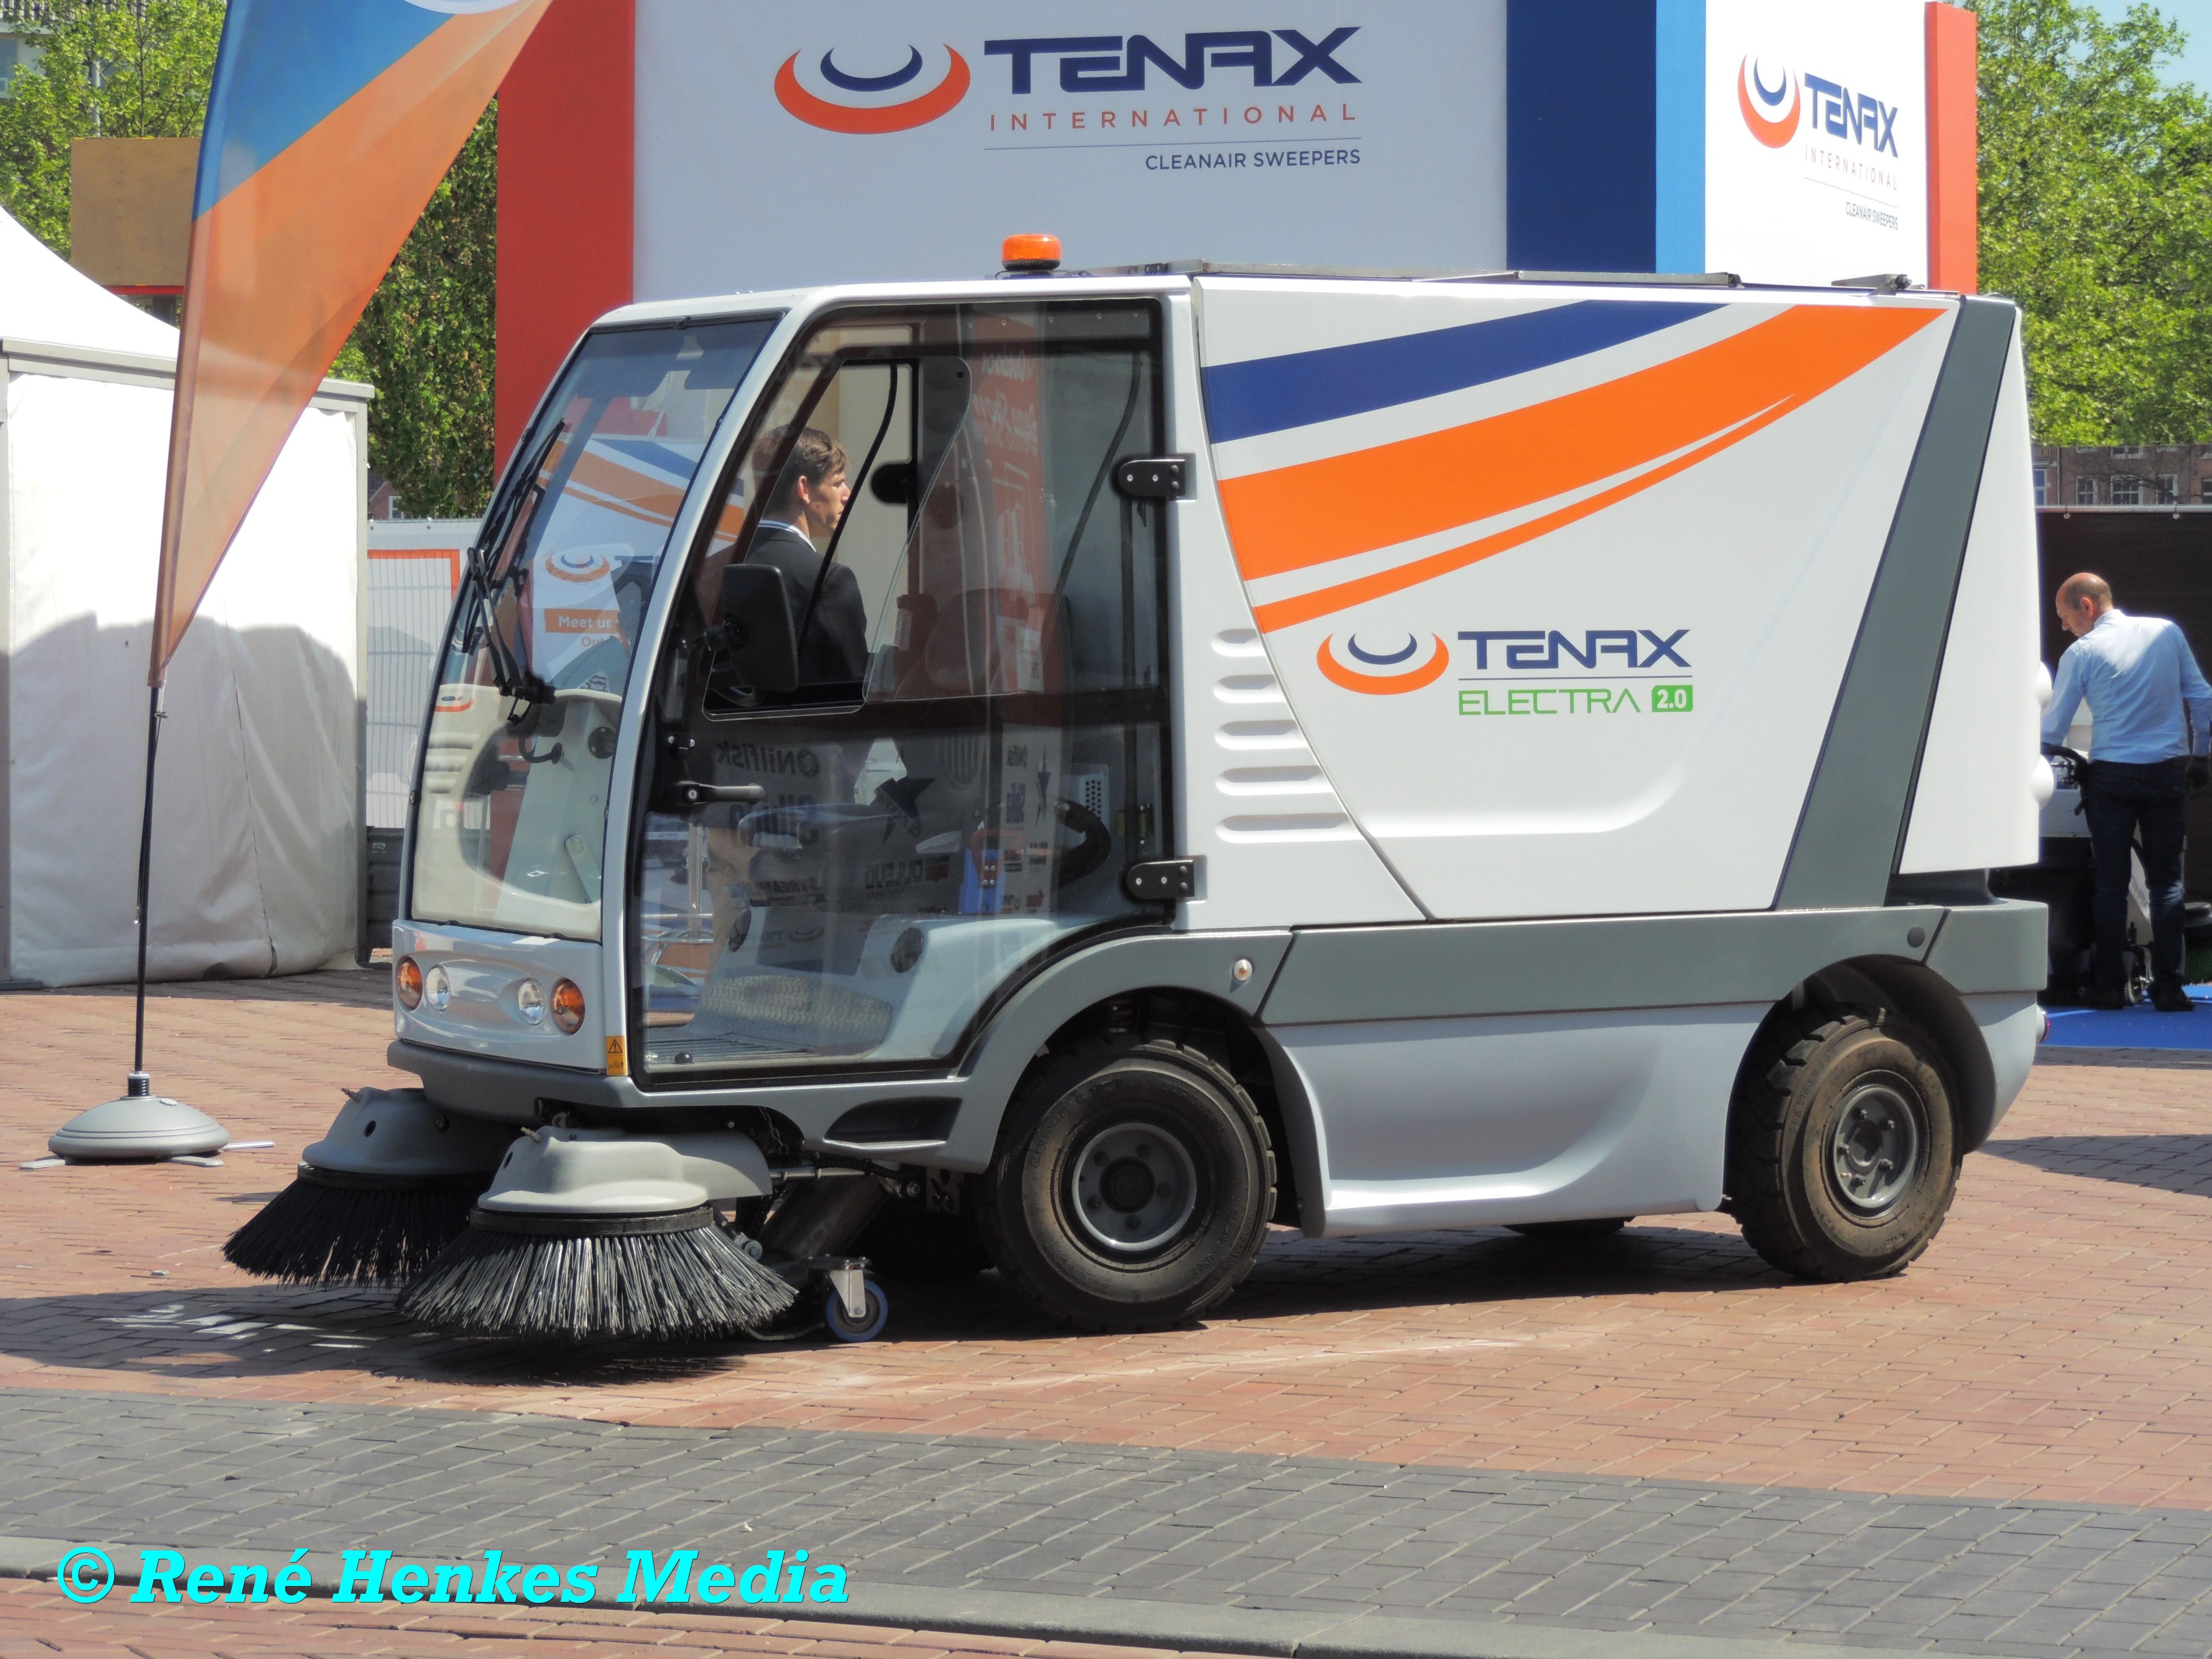 Tenax Electra 2.0